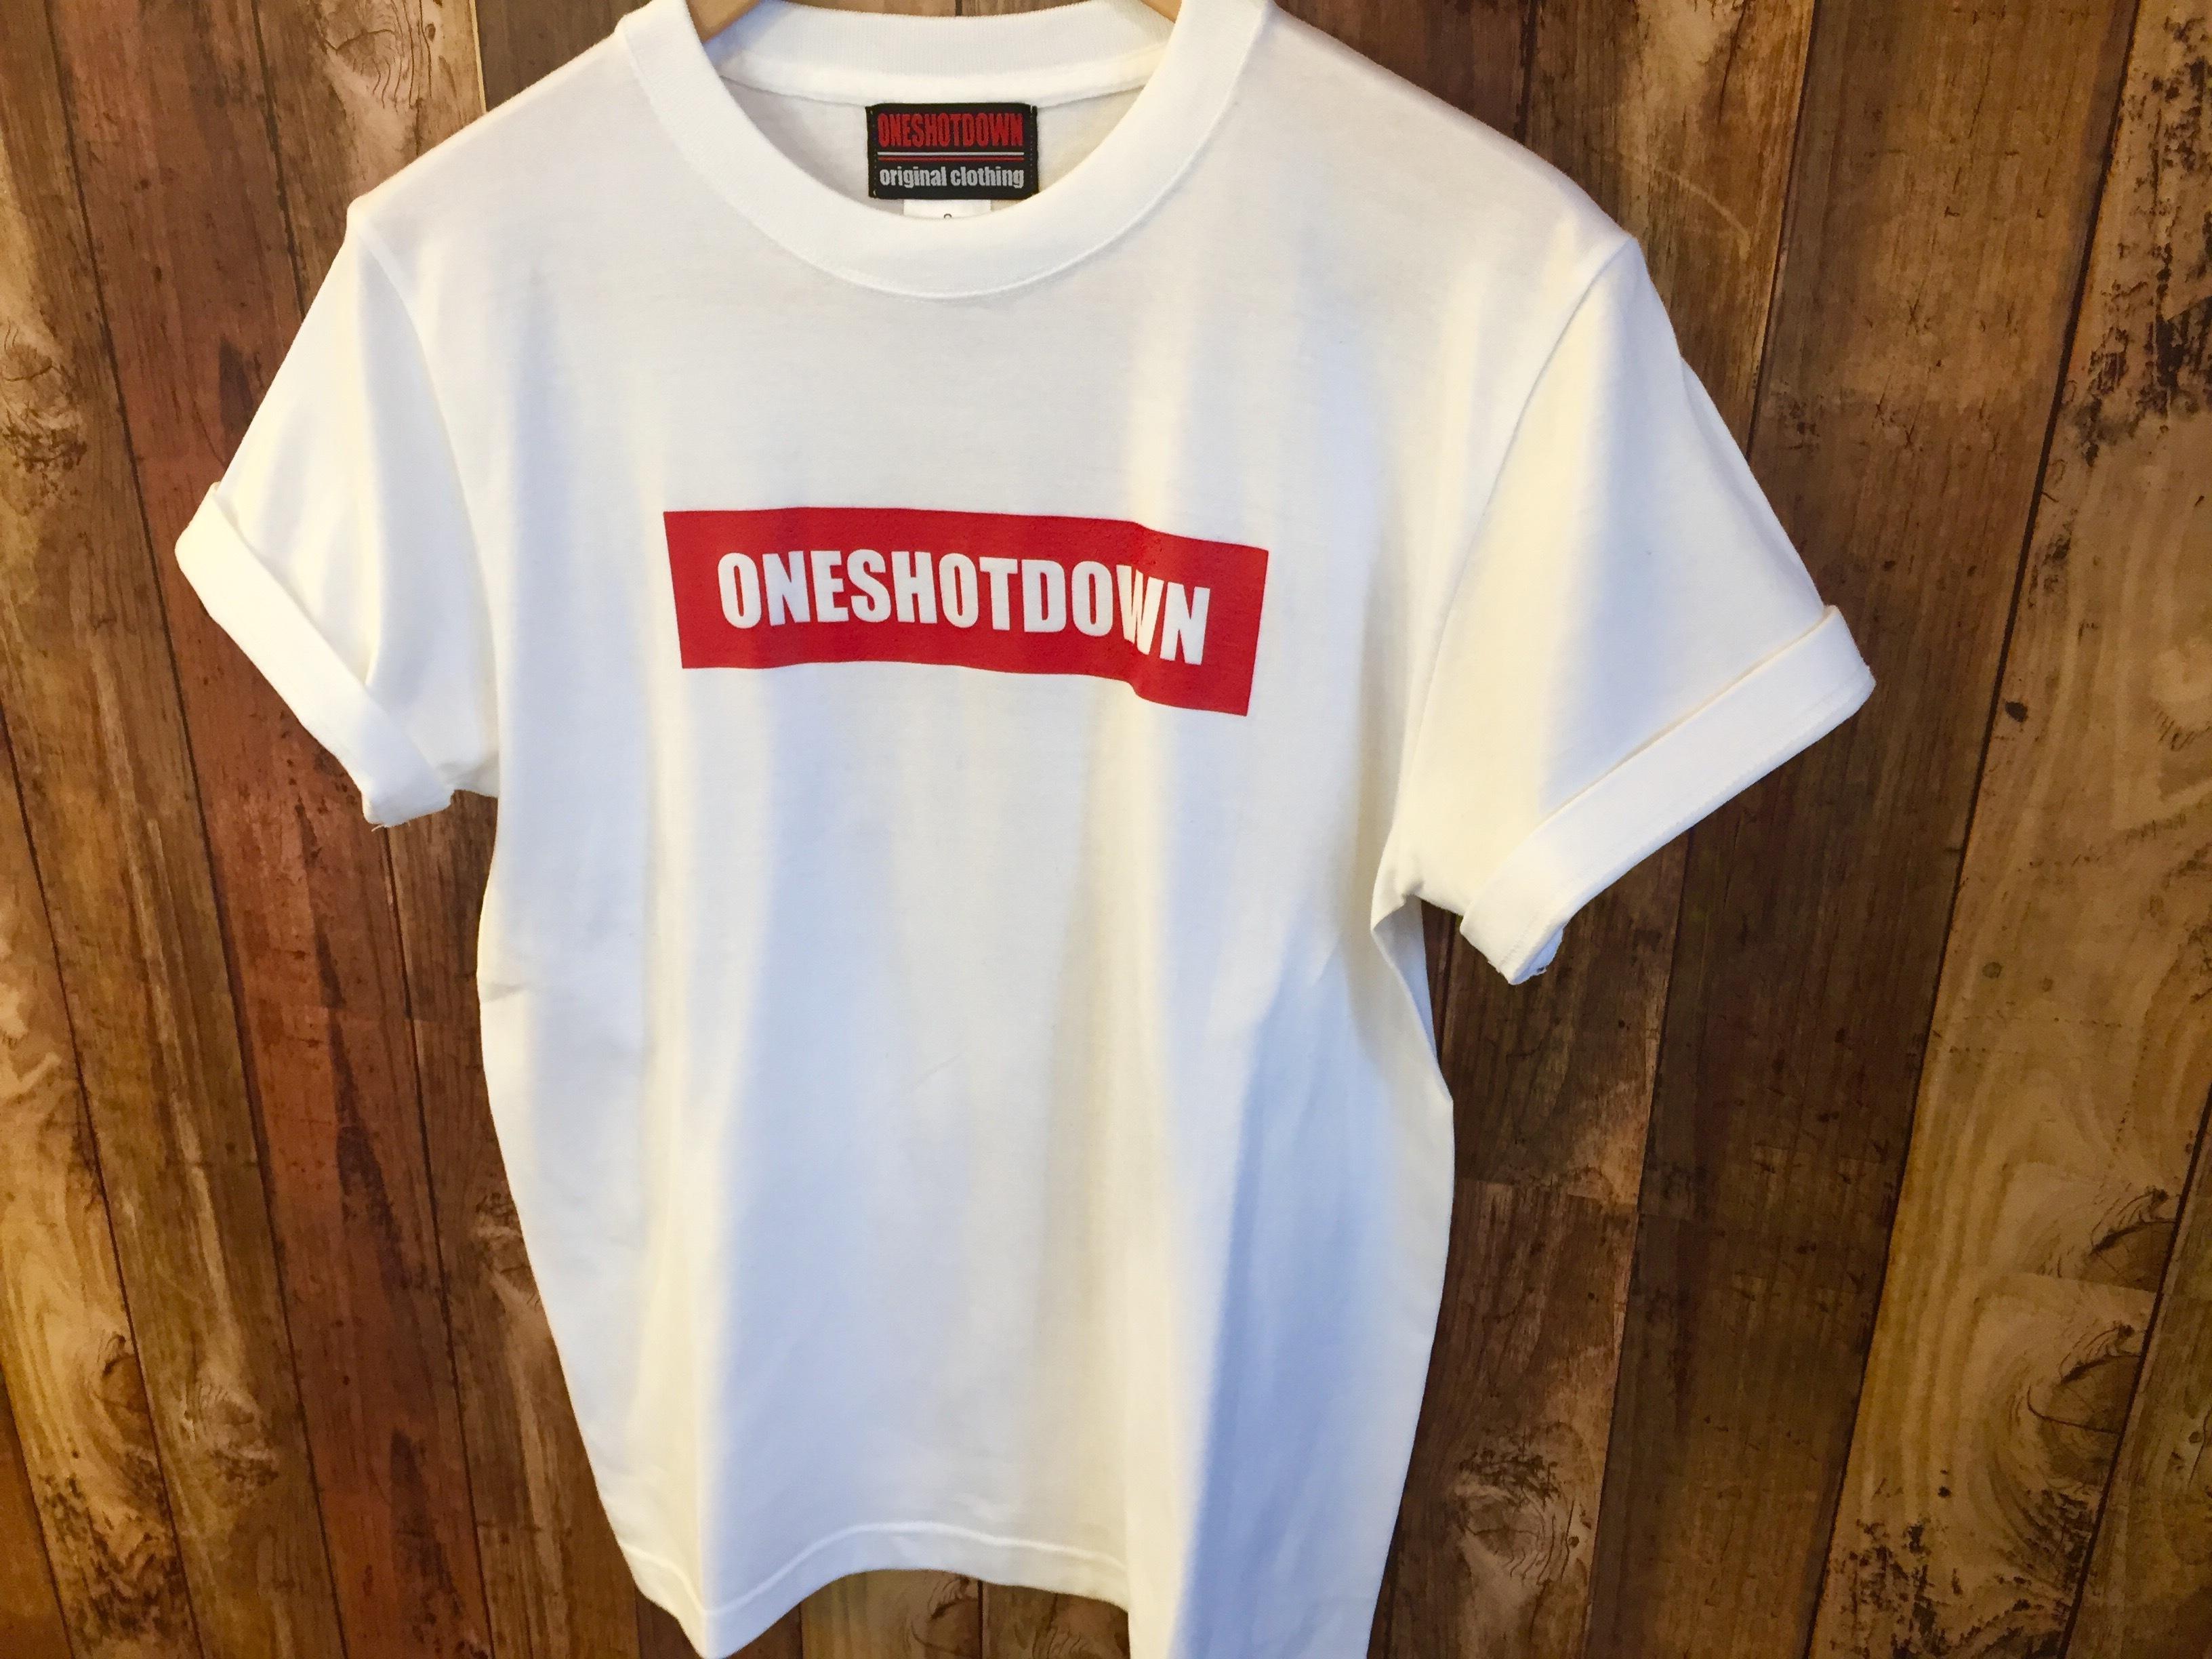 ONESHOTDOWN ボックスロゴ Tシャツ - 画像4